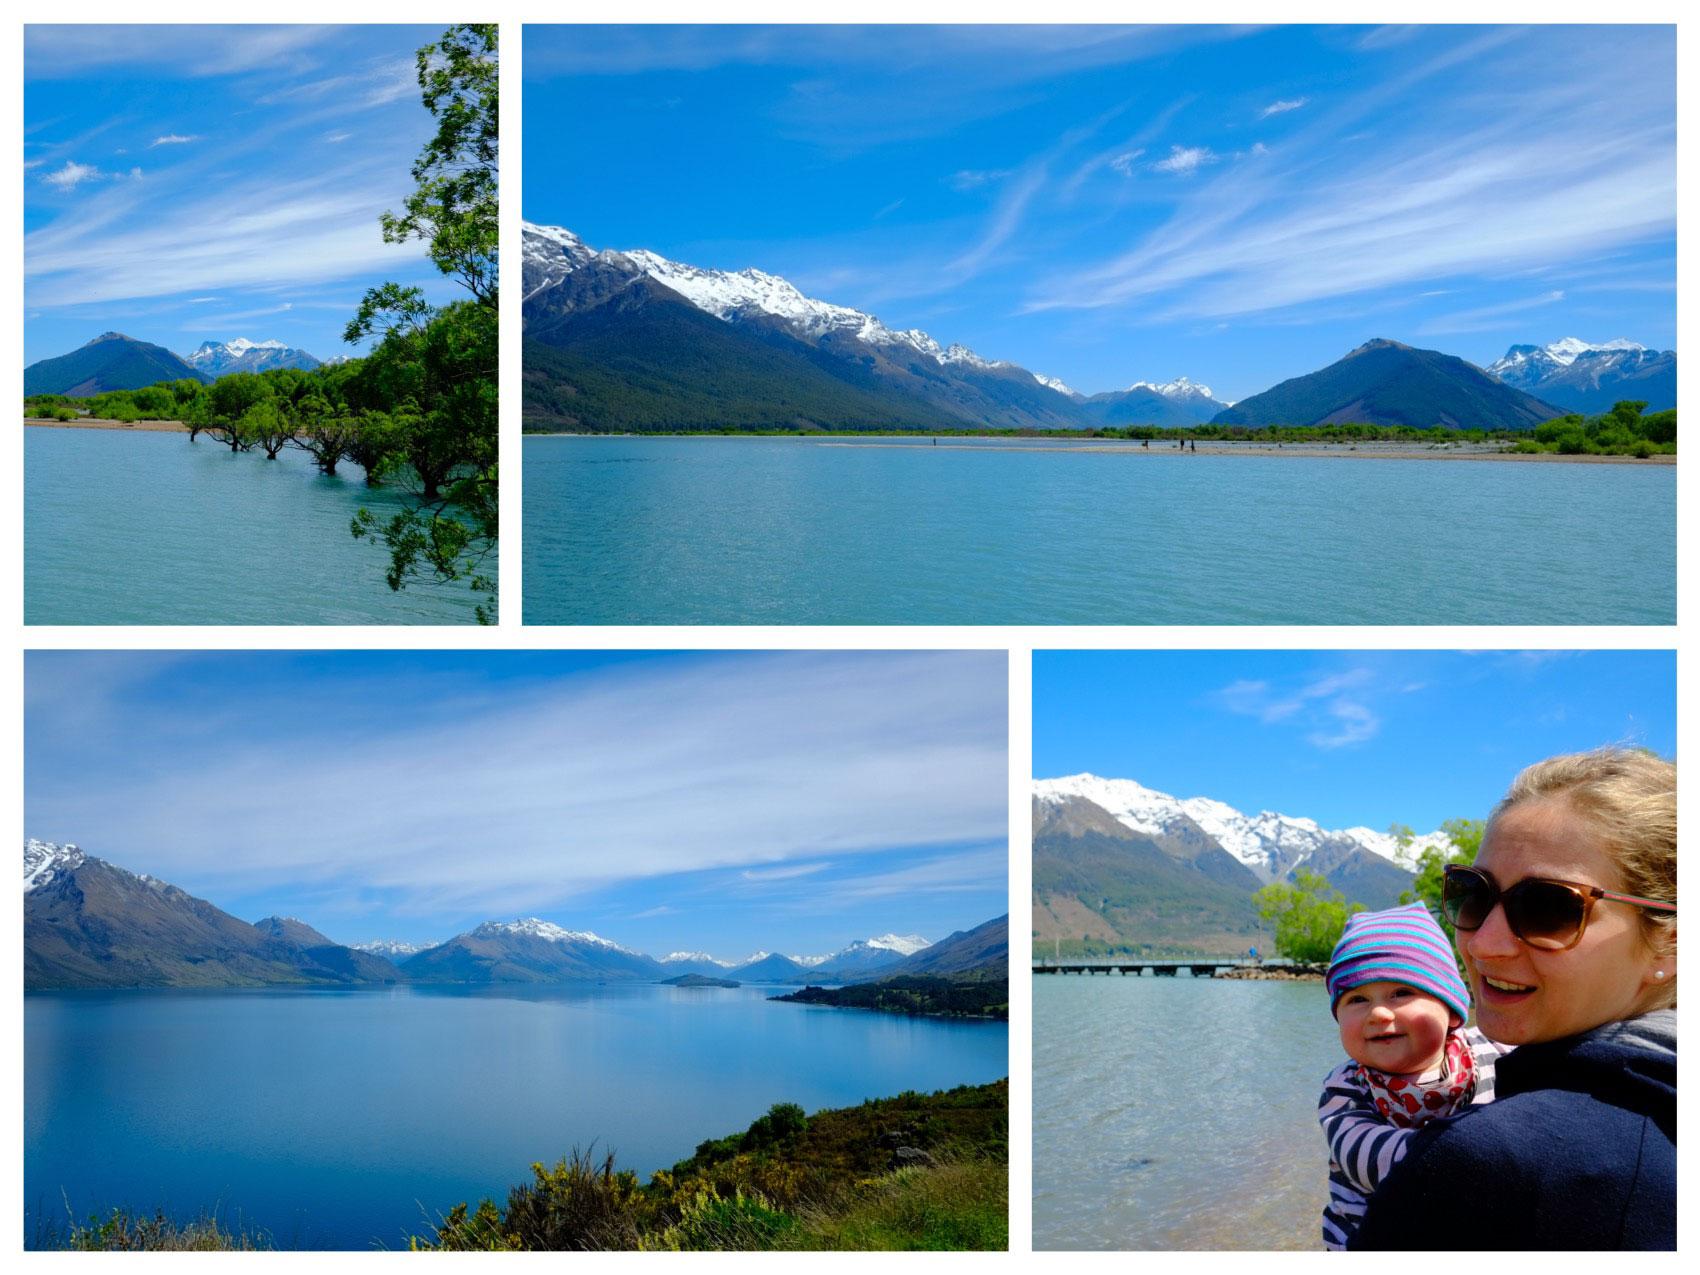 Glenorchy / Neuseeland am Lake Wakatipu